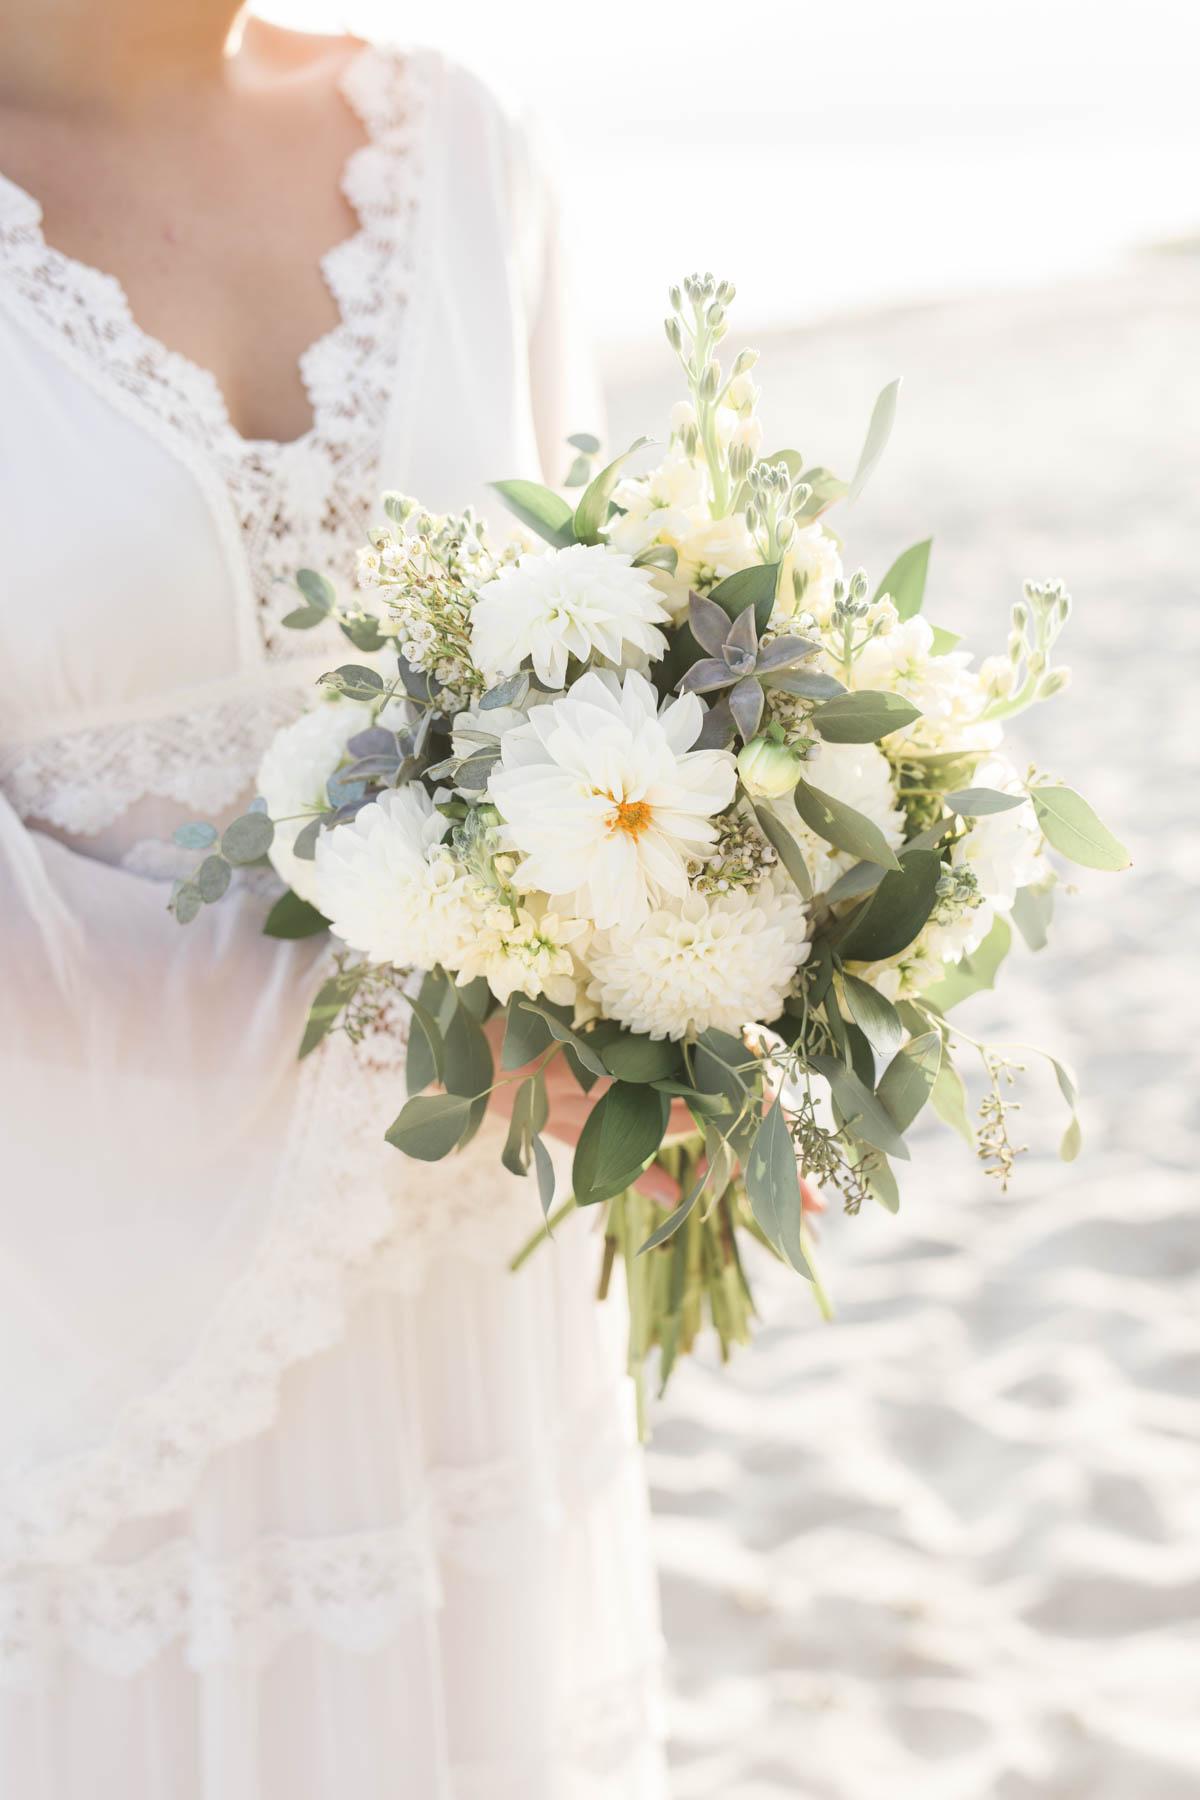 shotbychelsea_wedding_blog-47.jpg